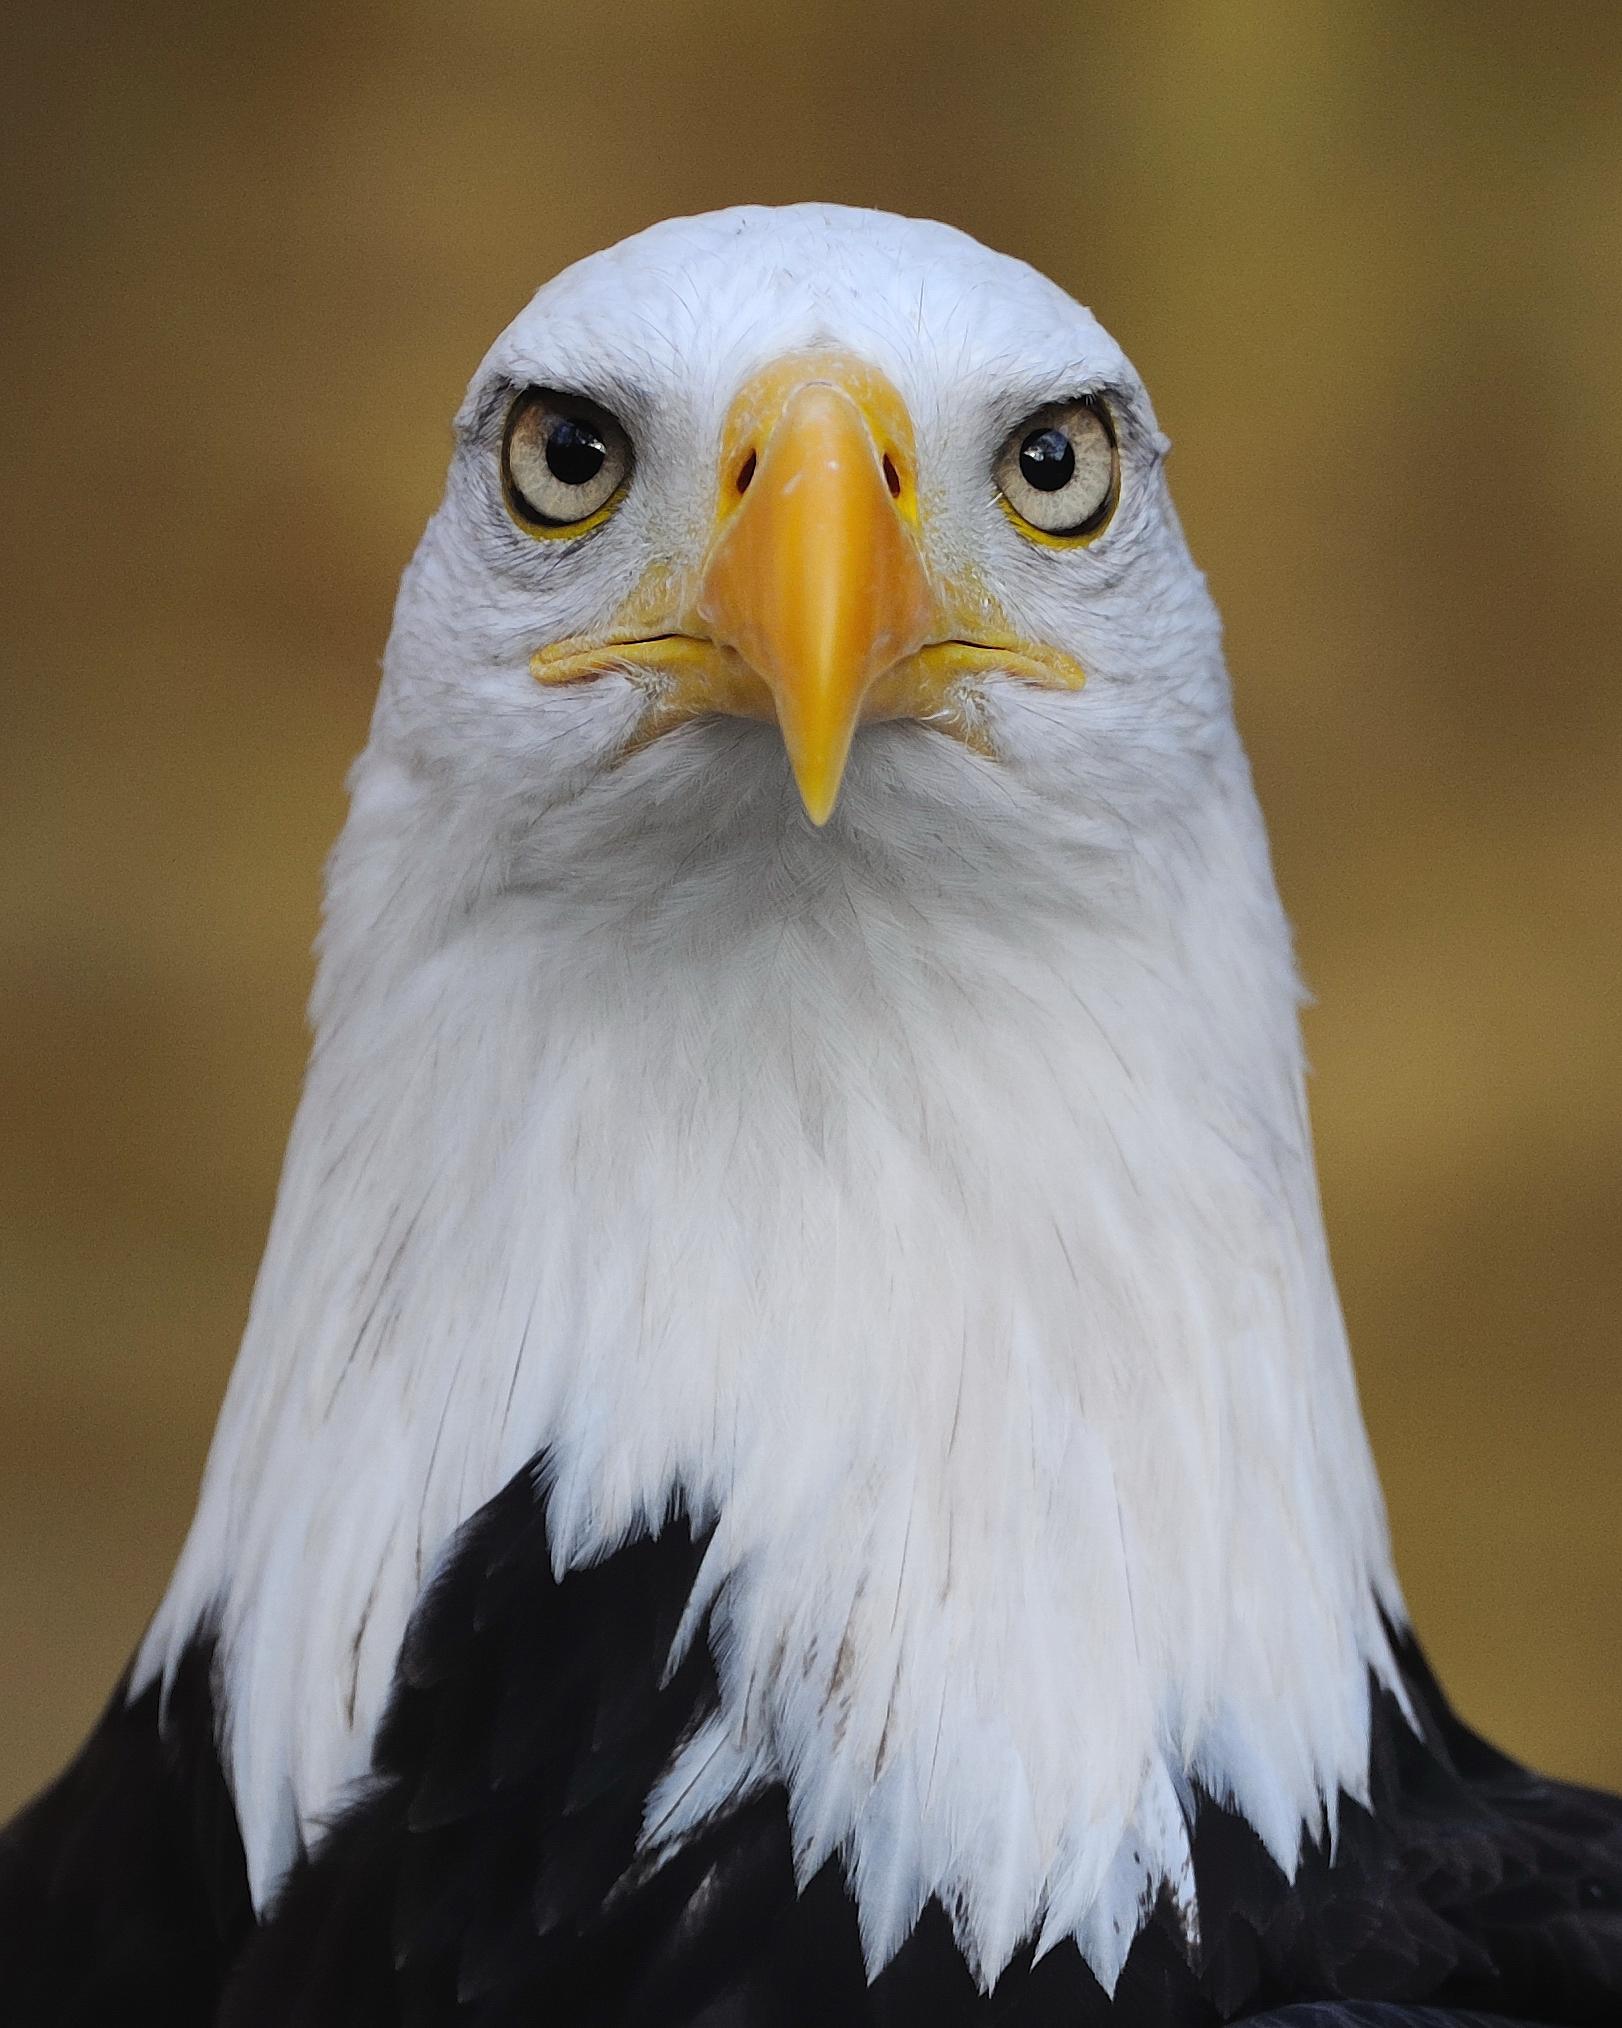 Convergence Binocular Vision an Eagle Binocular Vision